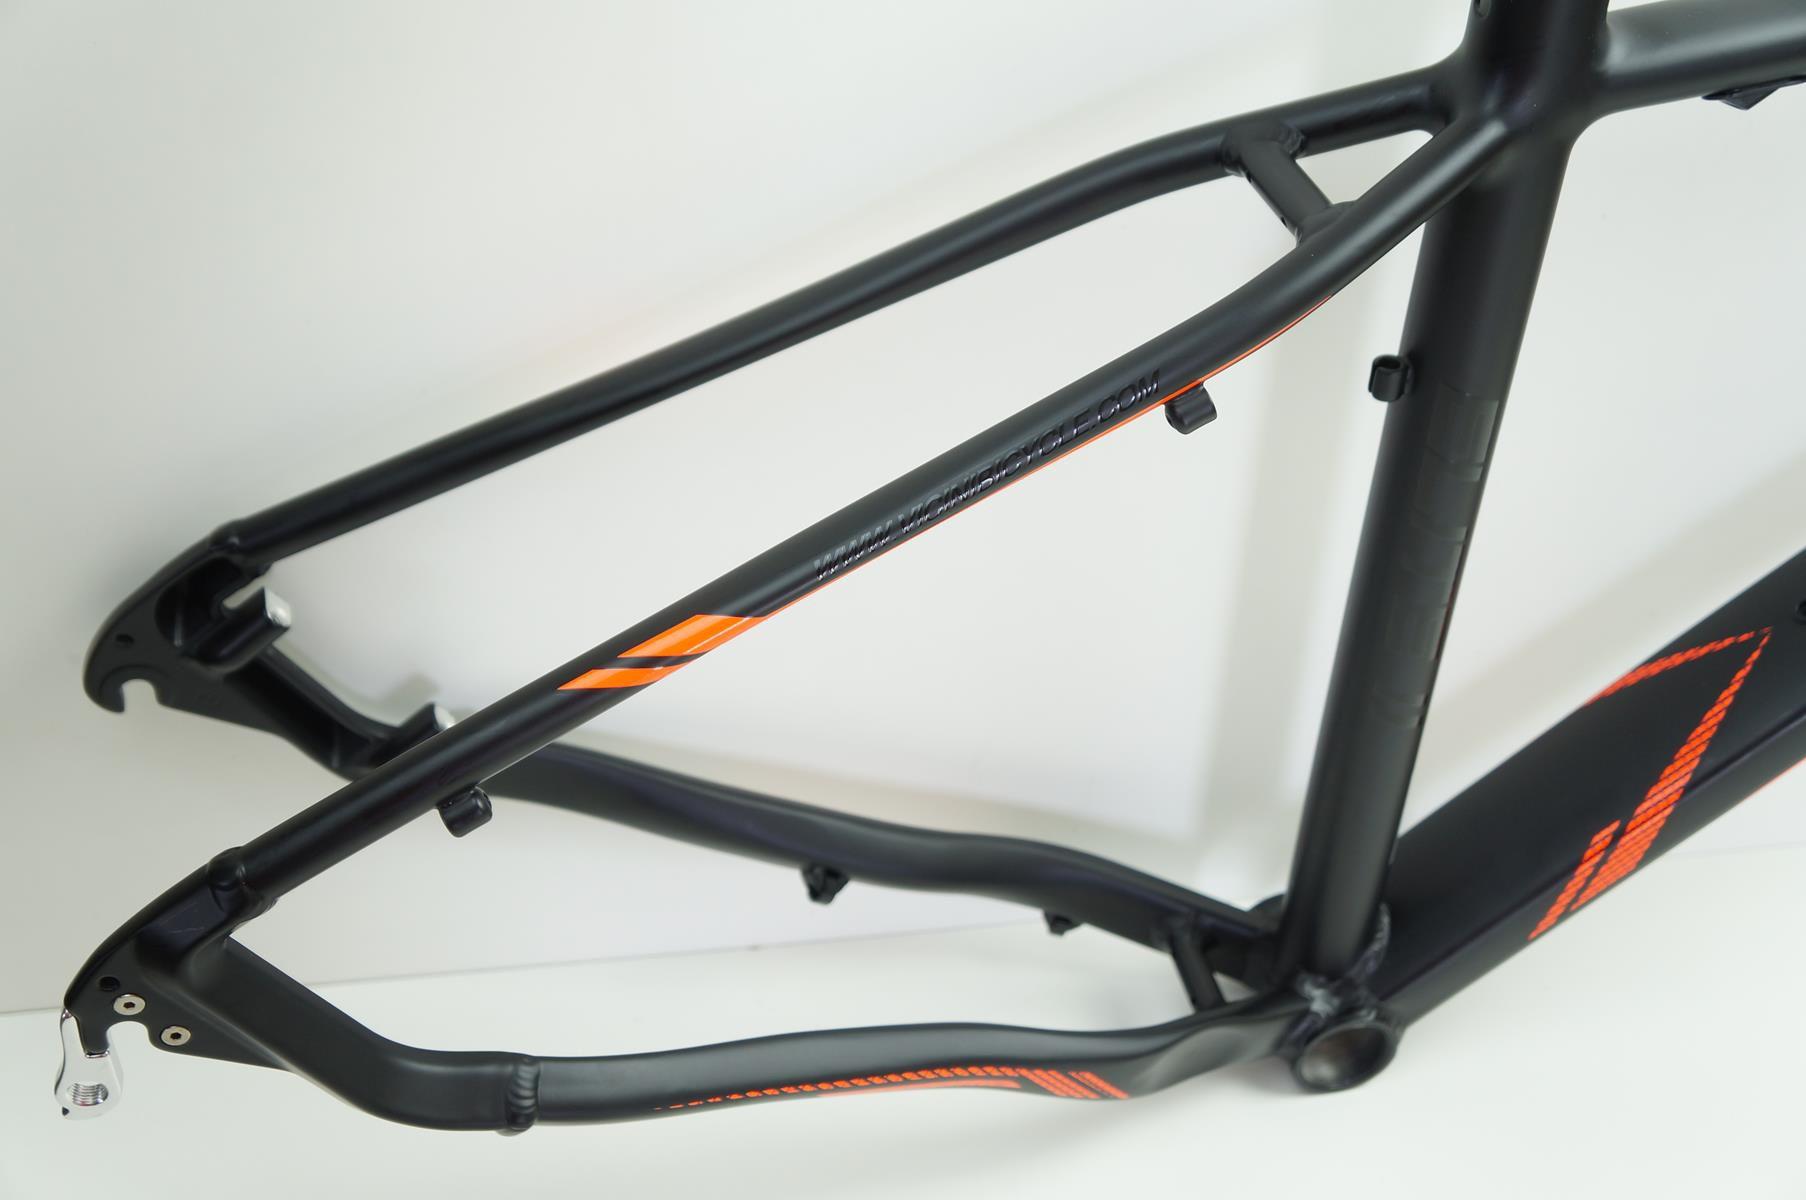 Quadro Bicicleta MTB Ballistech Elite II Aro 29 Preto Fosco Laranja em Aluminio 2019